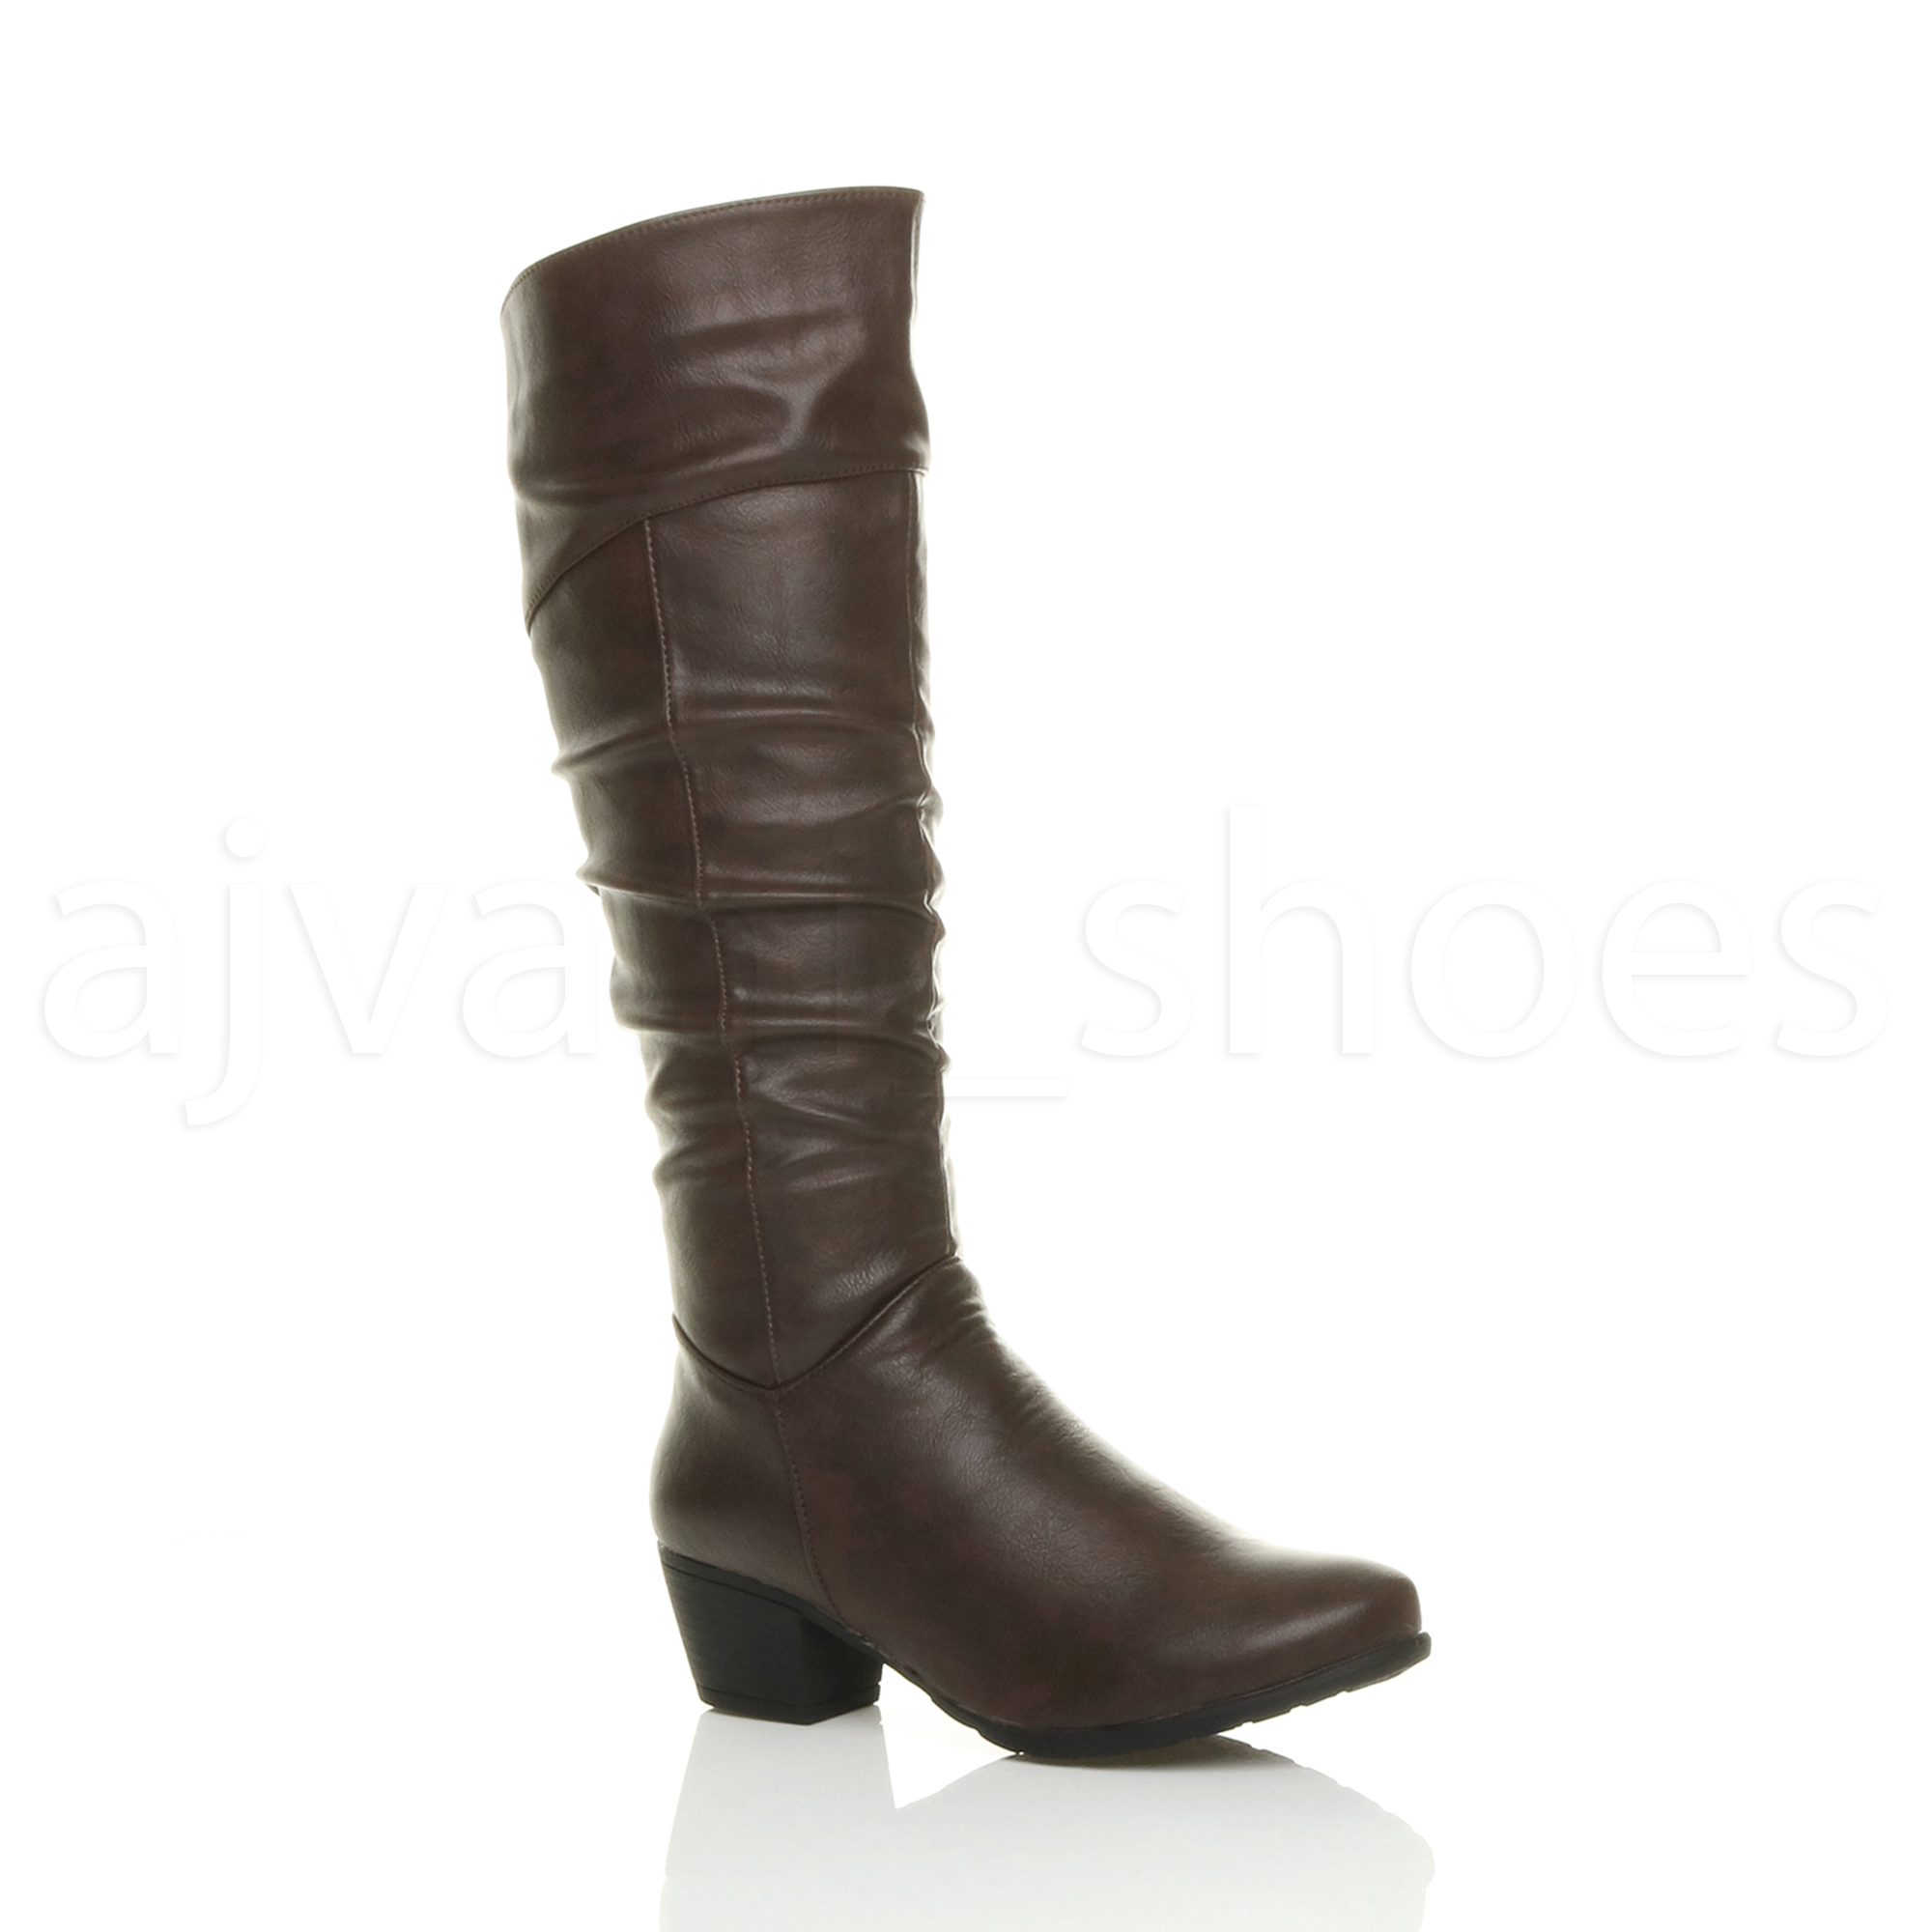 WOMENS-LADIES-CUBAN-MID-HEEL-ZIP-RUCHED-SLIM-CALF-COWBOY-RIDING-KNEE-BOOTS-SIZE